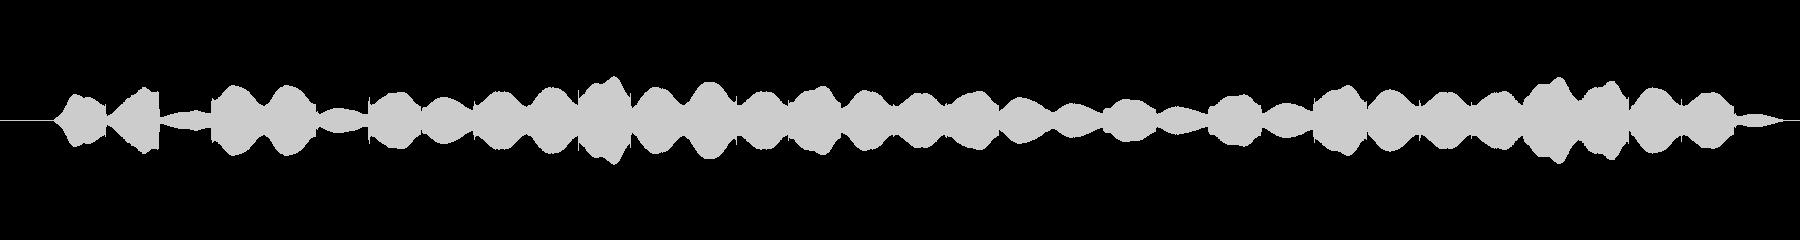 FX トーキングロボット03の未再生の波形